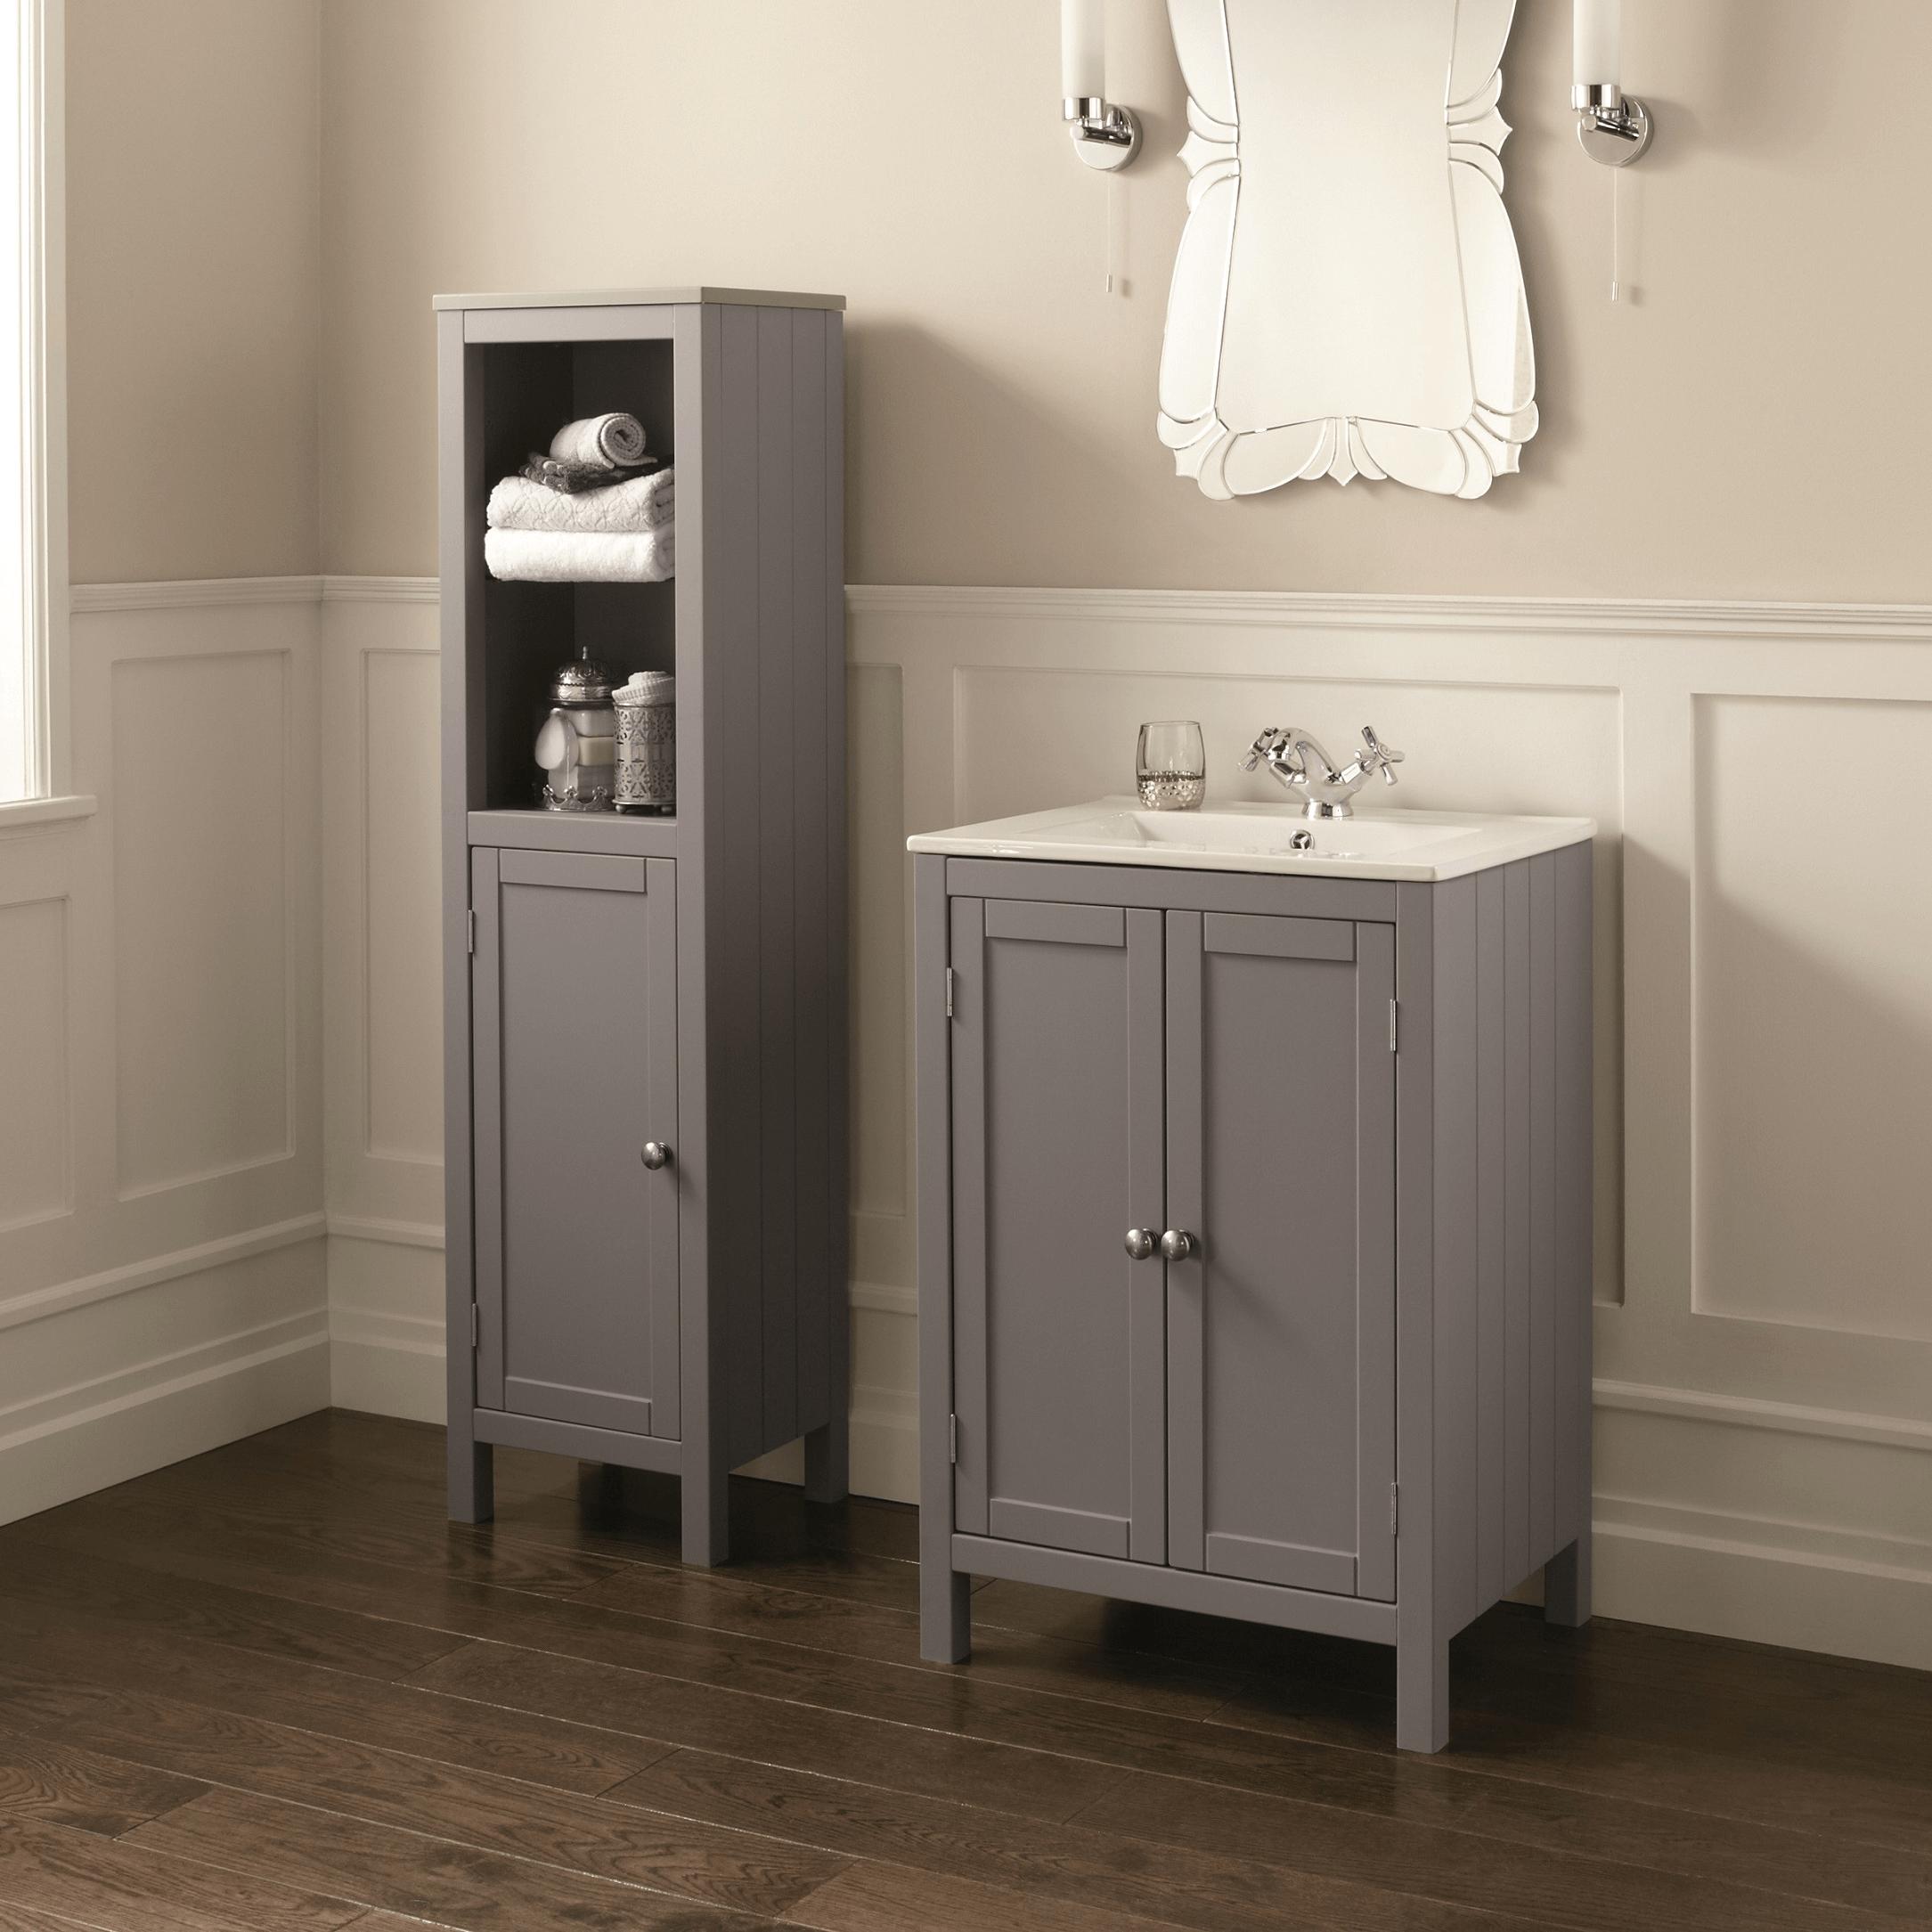 How tall are bathroom vanity